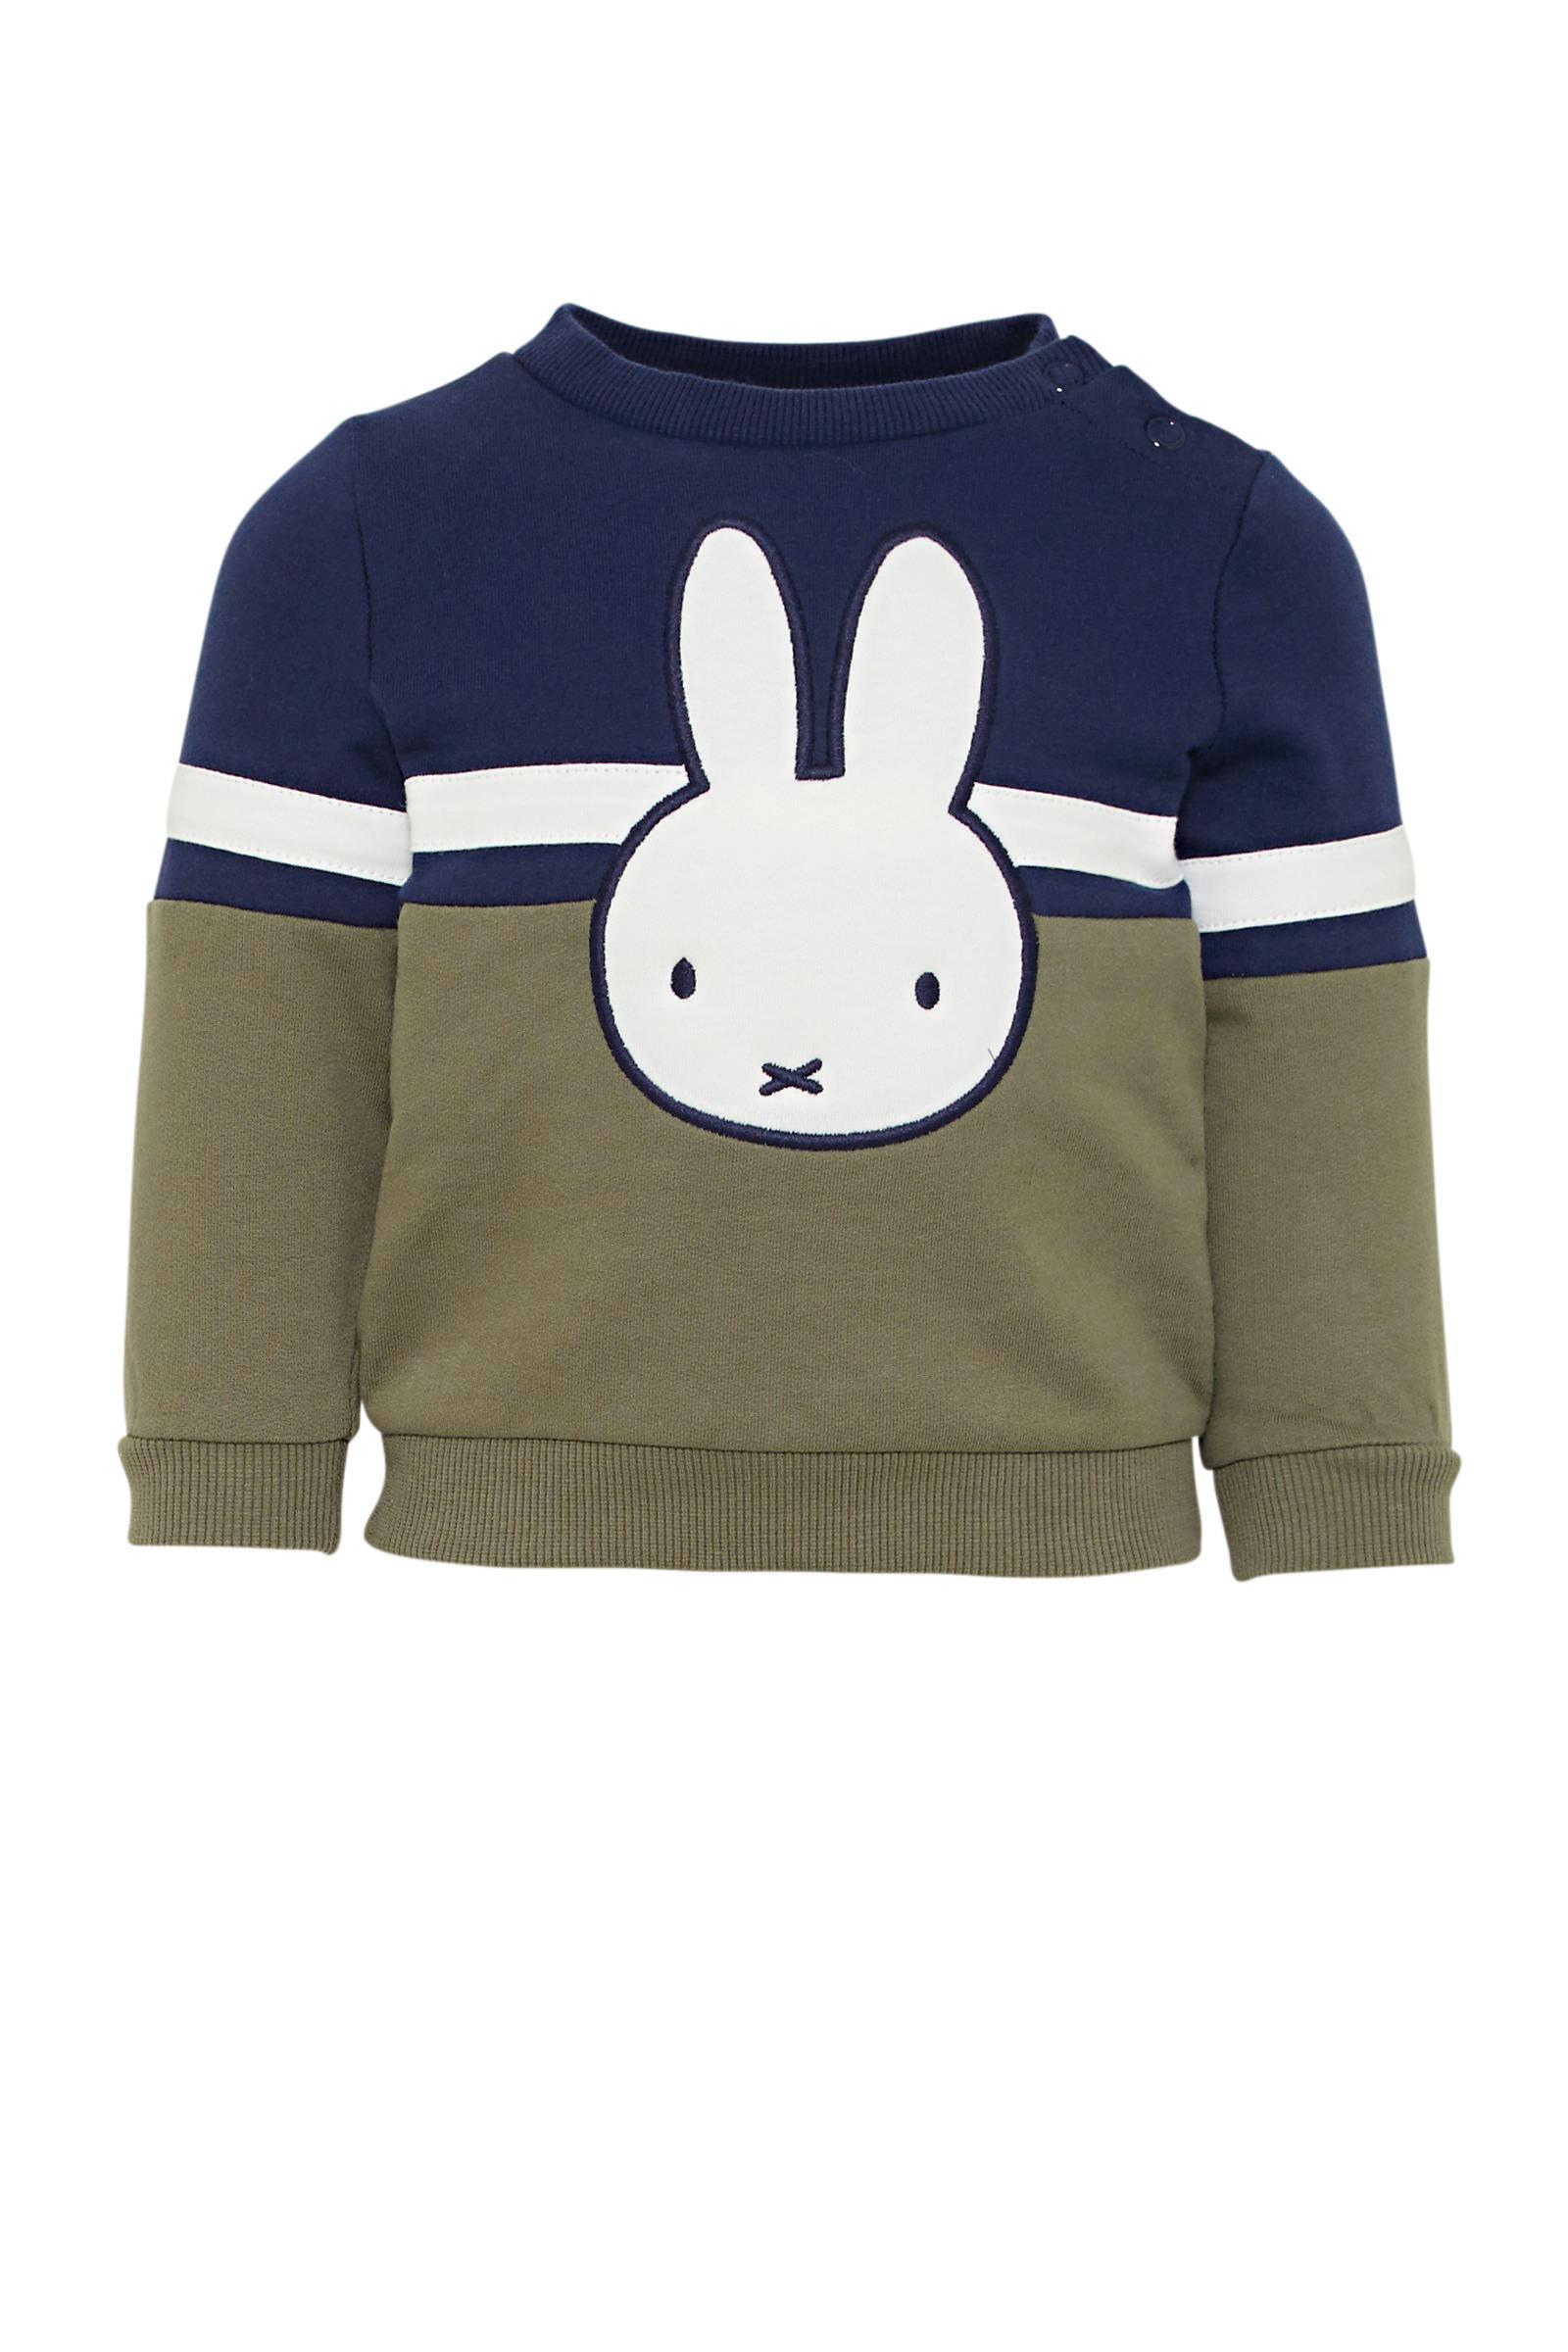 C&A nijntje sweater | wehkamp